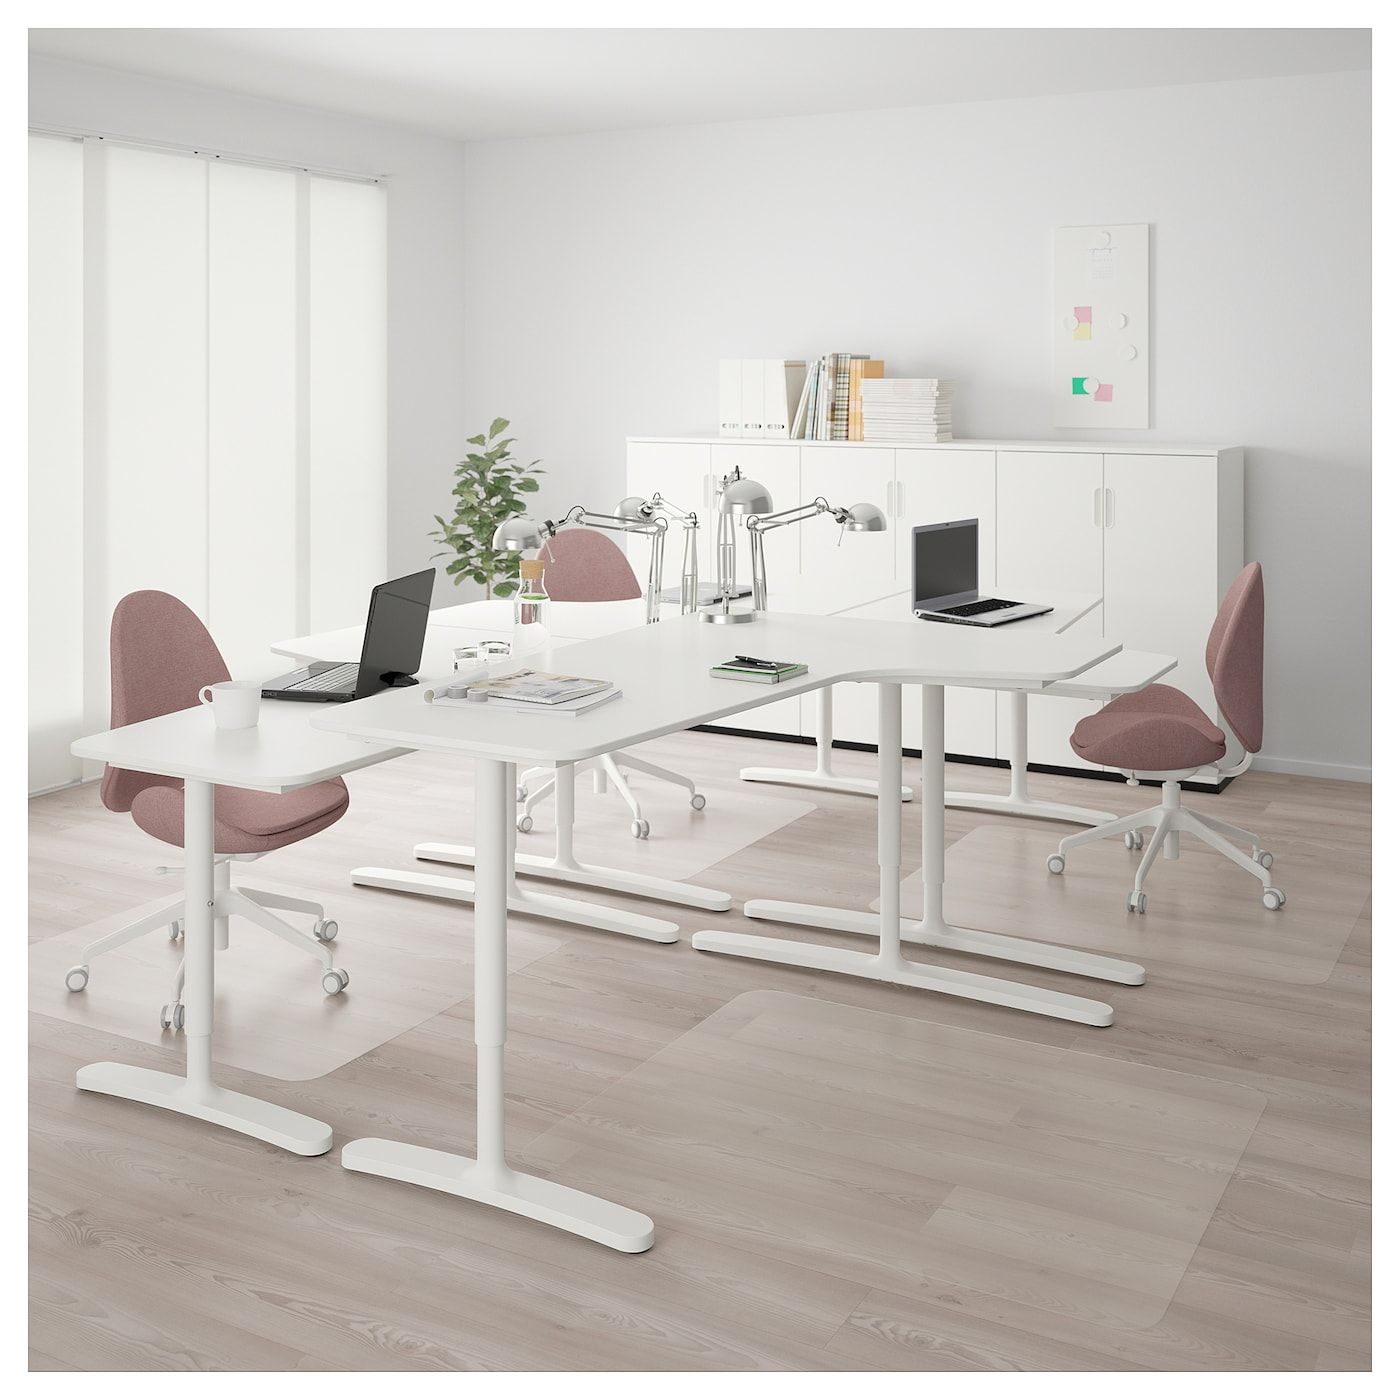 Bekant White Desk Combination 320x220 Cm Ikea Cheap Office Furniture Ikea Bekant Ikea Bekant Desk